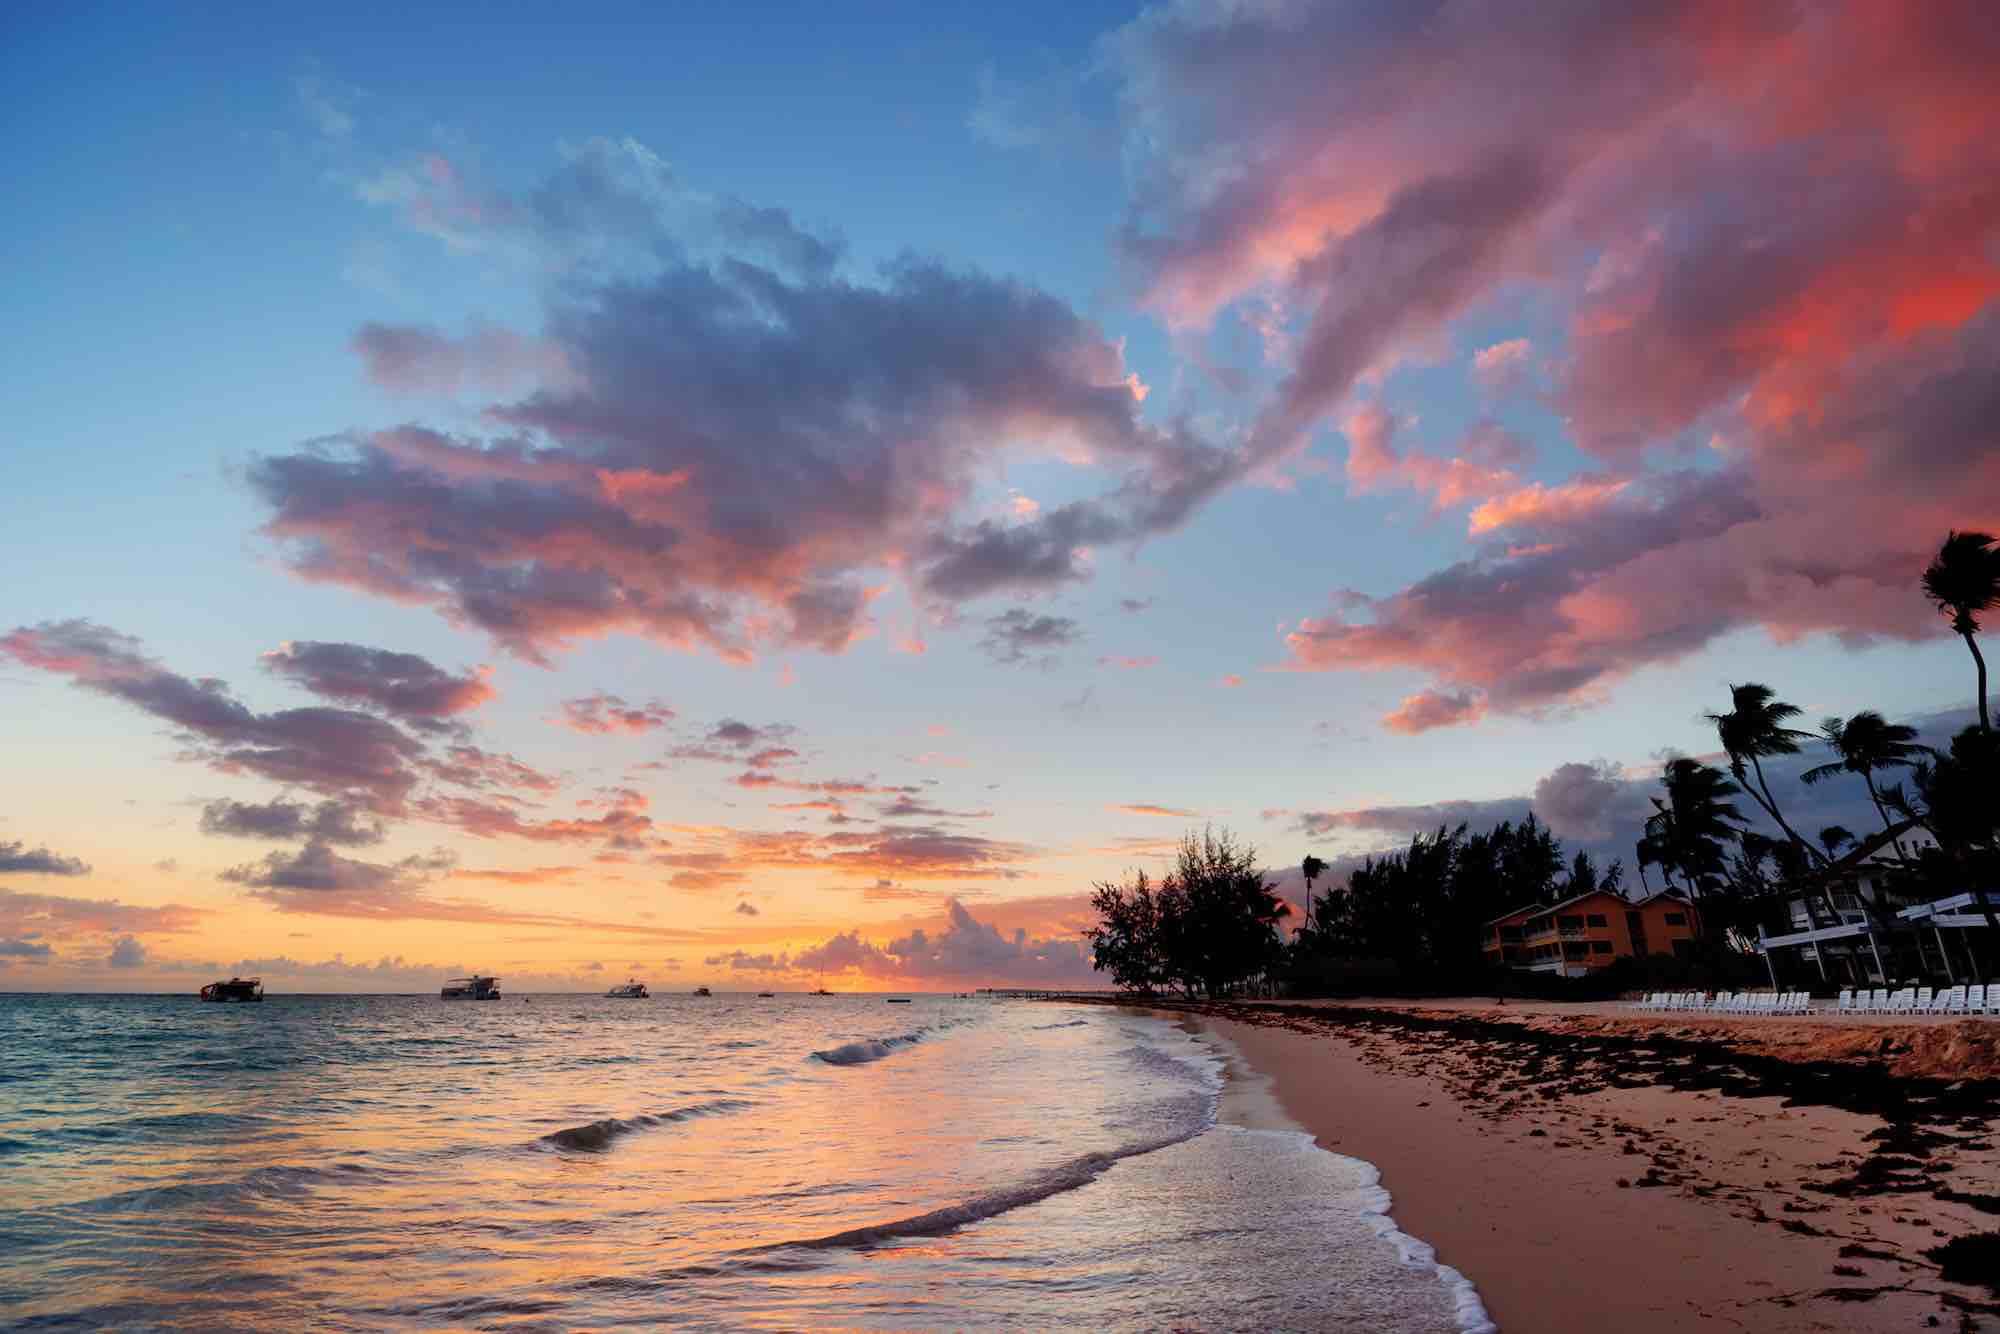 Andaman Islands_sailing along a beautiful beach rosy cloud sunset_XS.jpeg